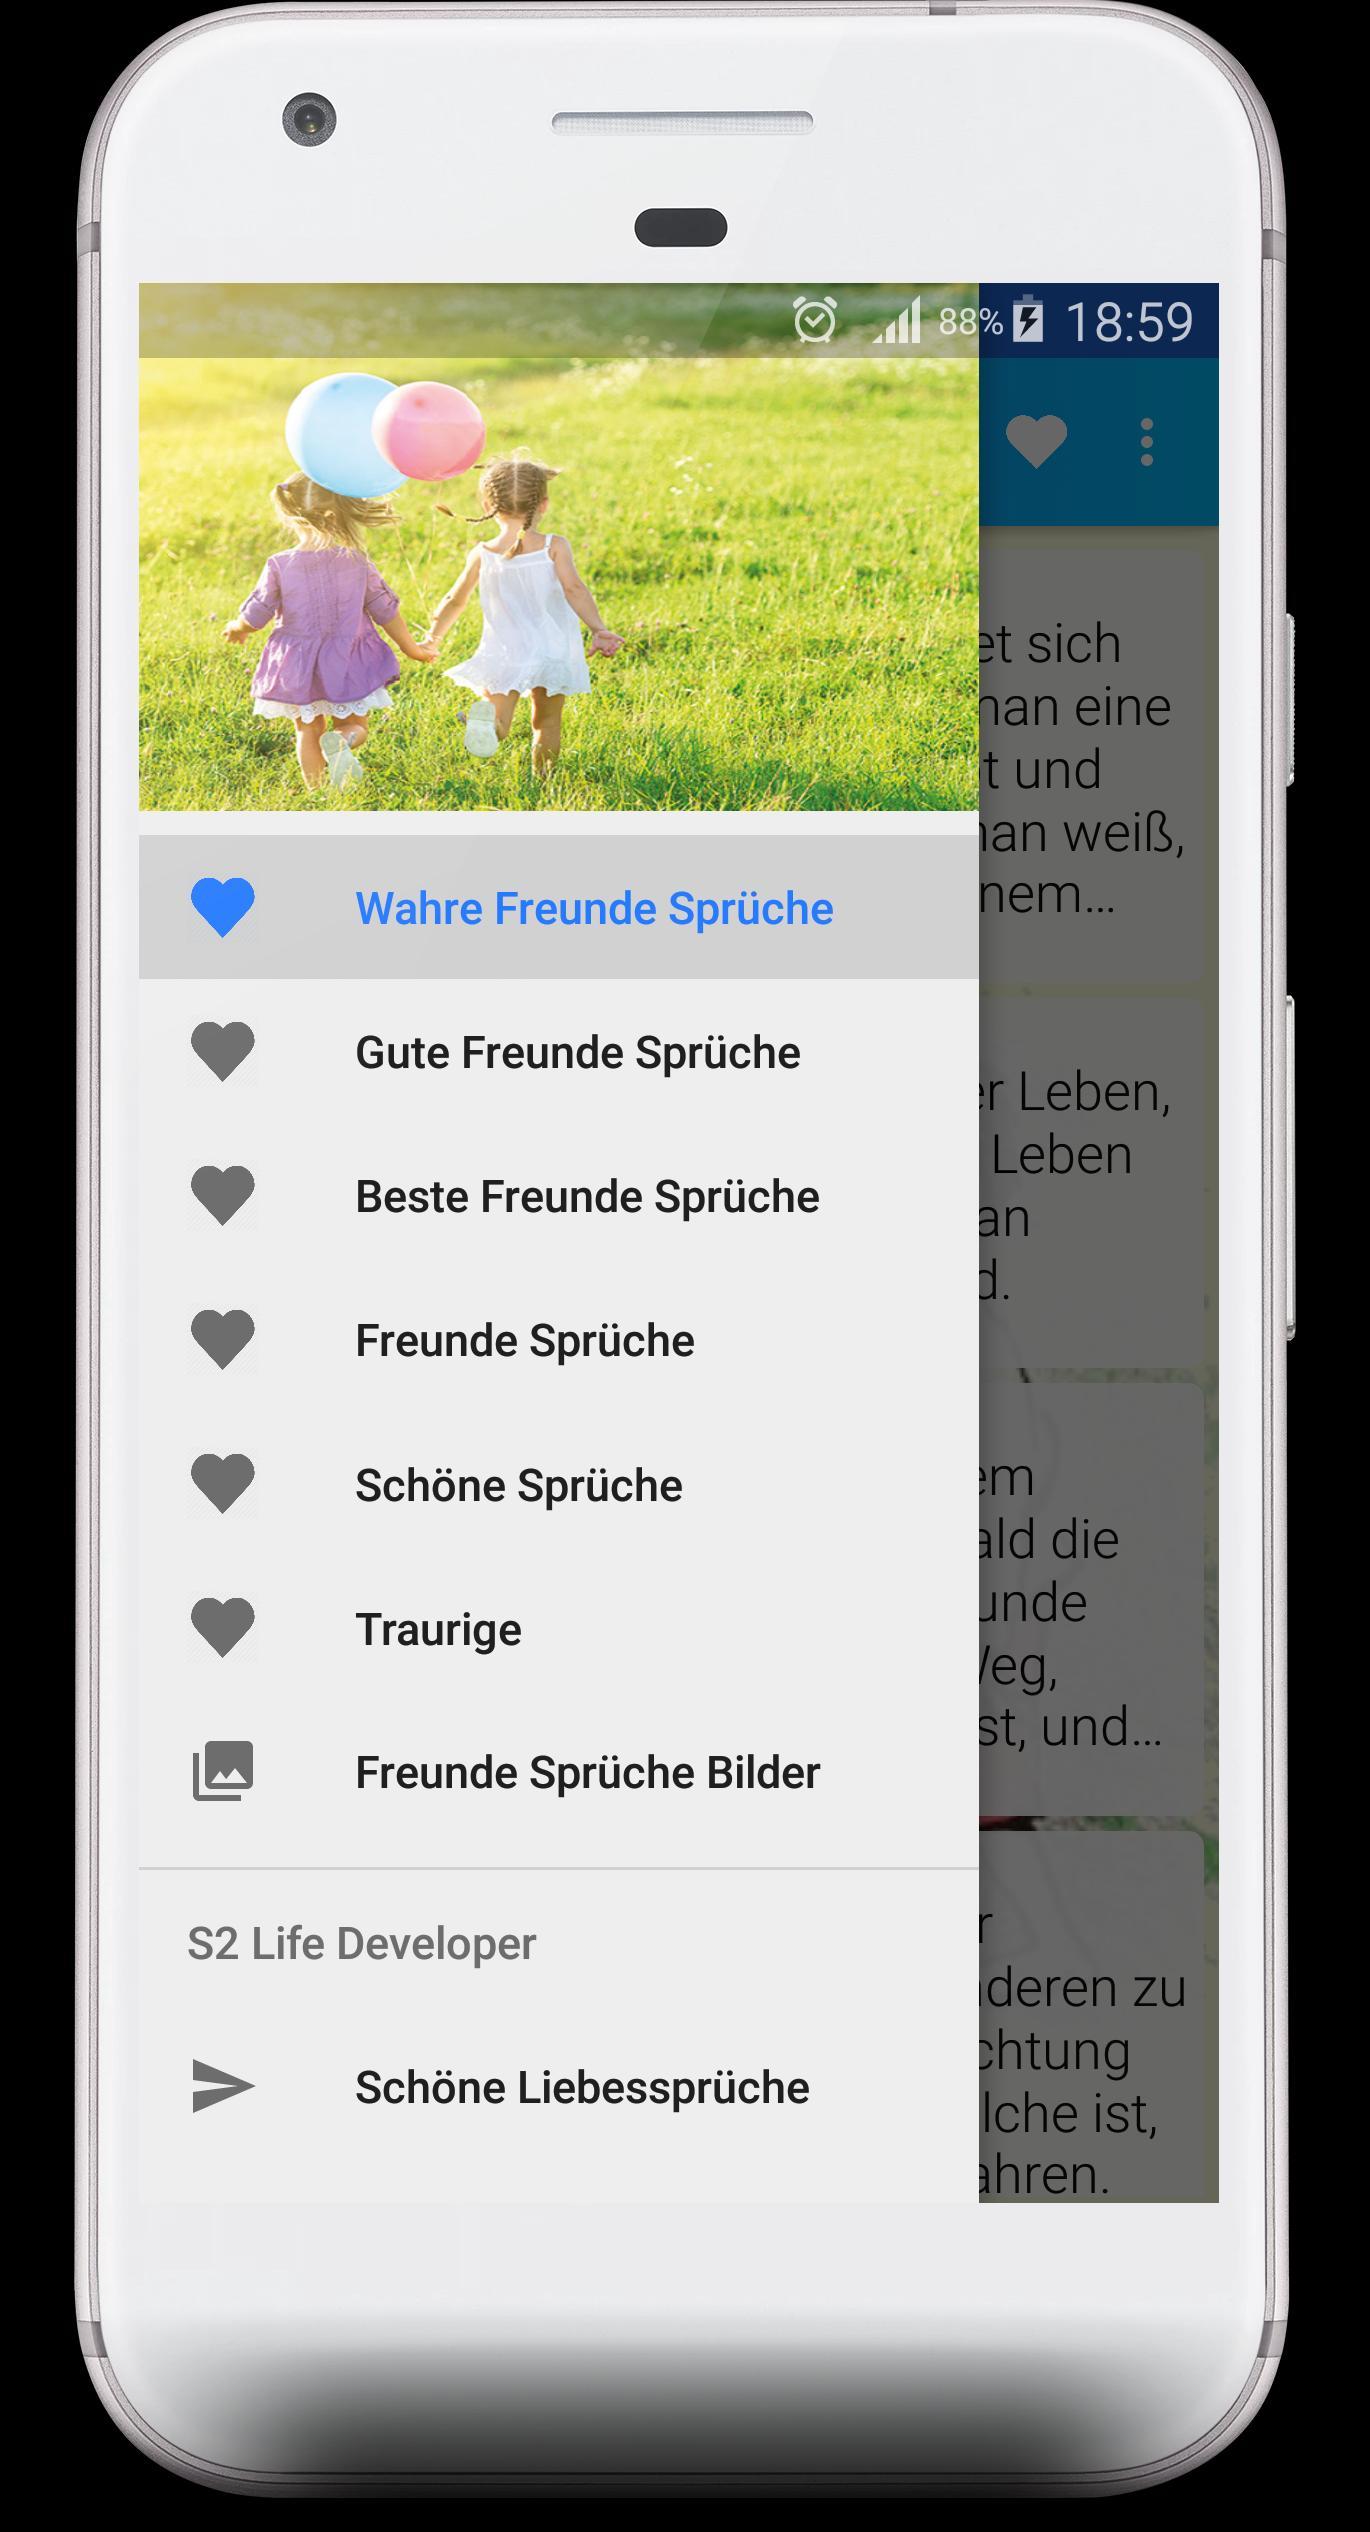 Freundschaft Sprüche For Android Apk Download